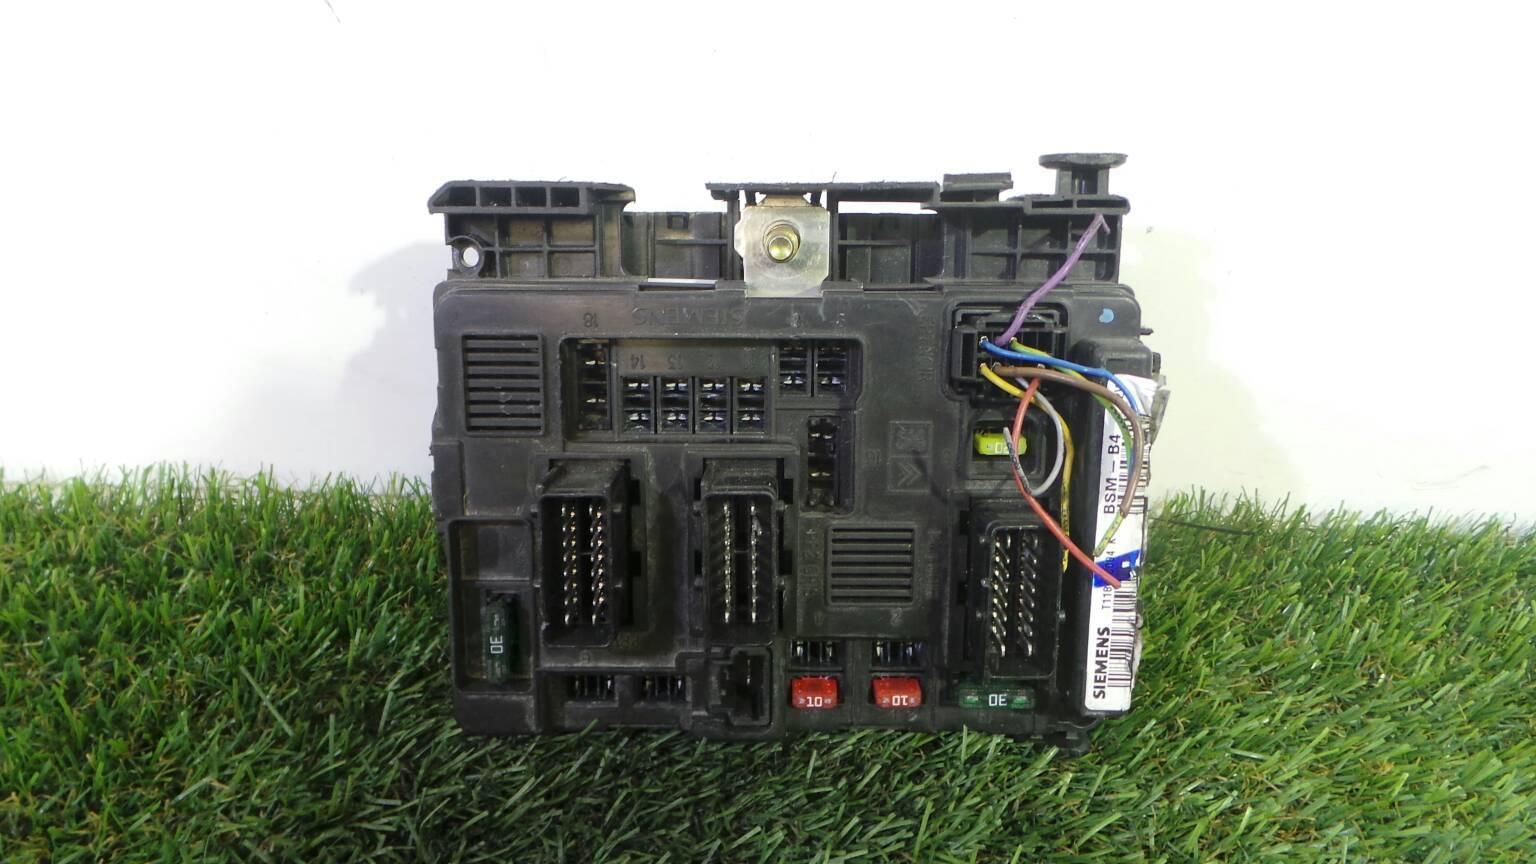 hight resolution of fuse box 96 434 98780 00 citro n c3 pluriel hb 1 4 hdi